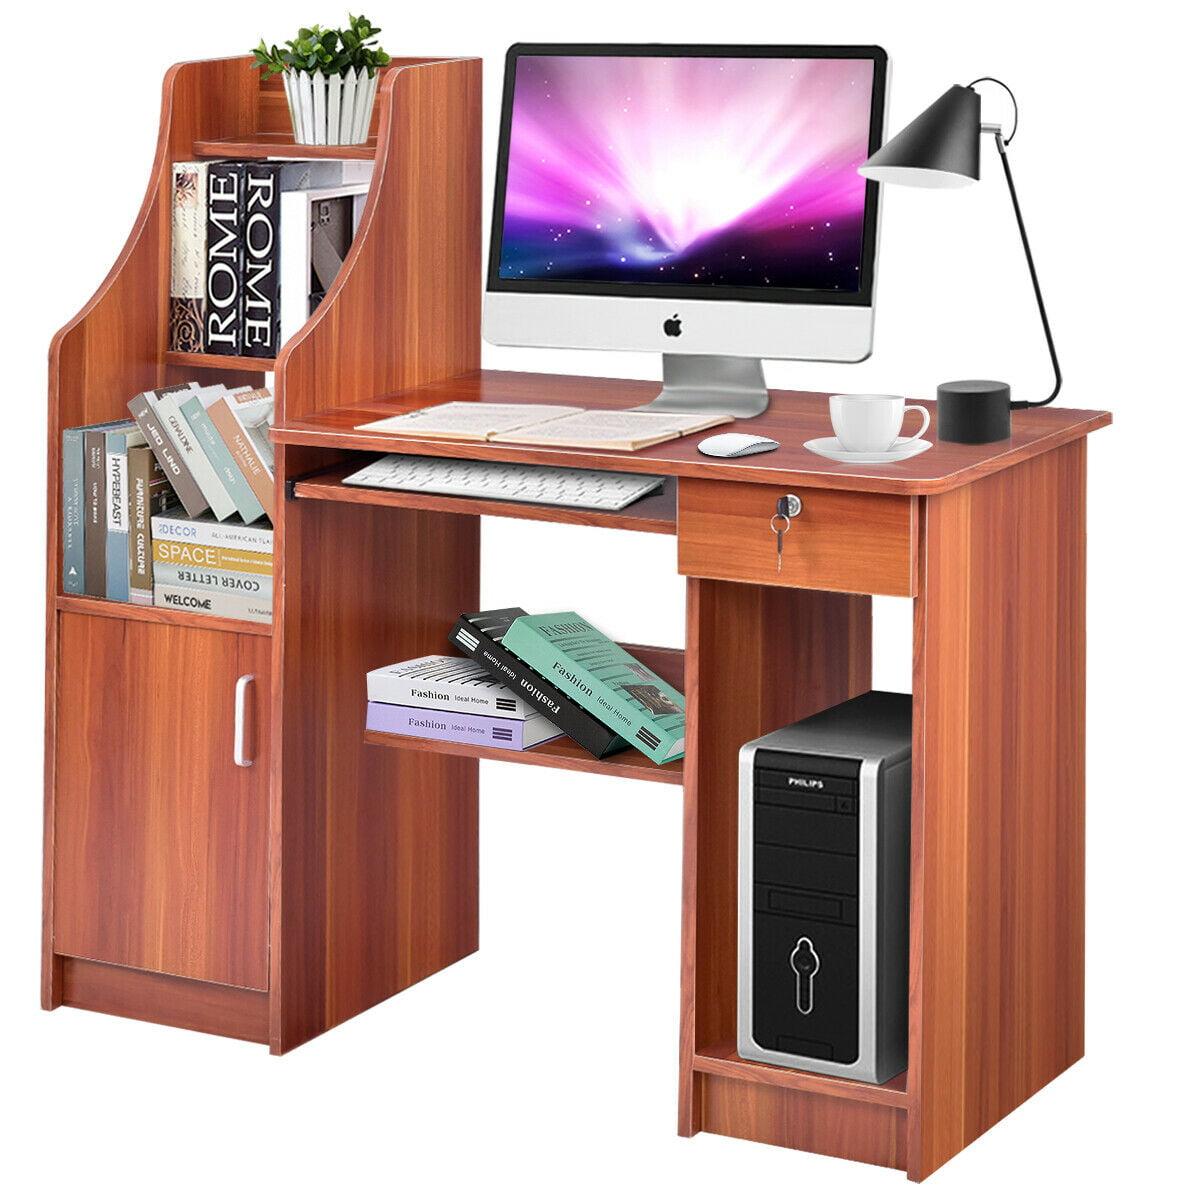 Gymax Computer Study Desk Laptop Table Writing Workstation W/Bookshelf -  Walmart.com